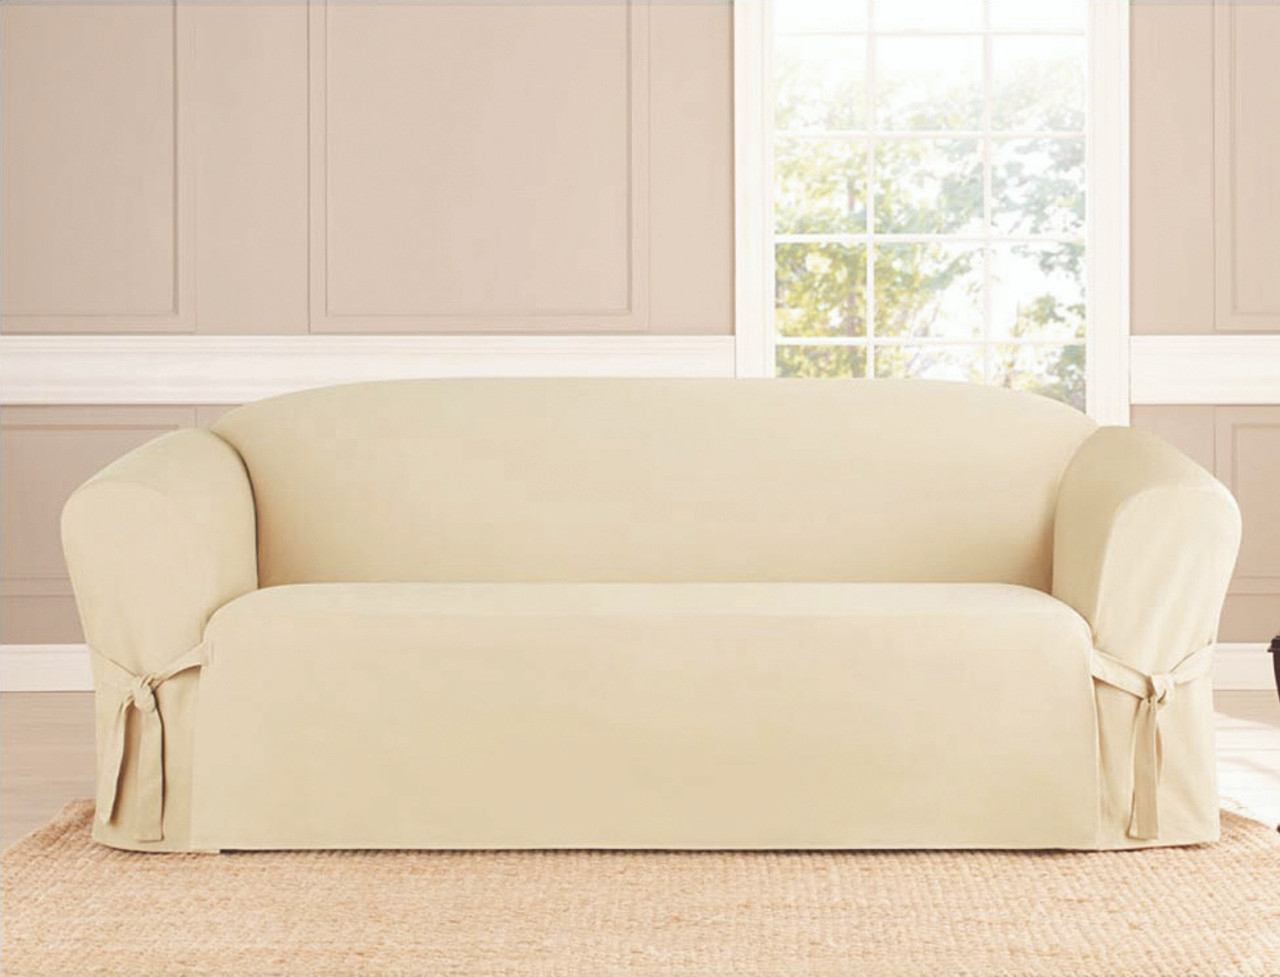 Kashi Home MicroSuede Sofa Slipcover Beige Black Brown Ruby